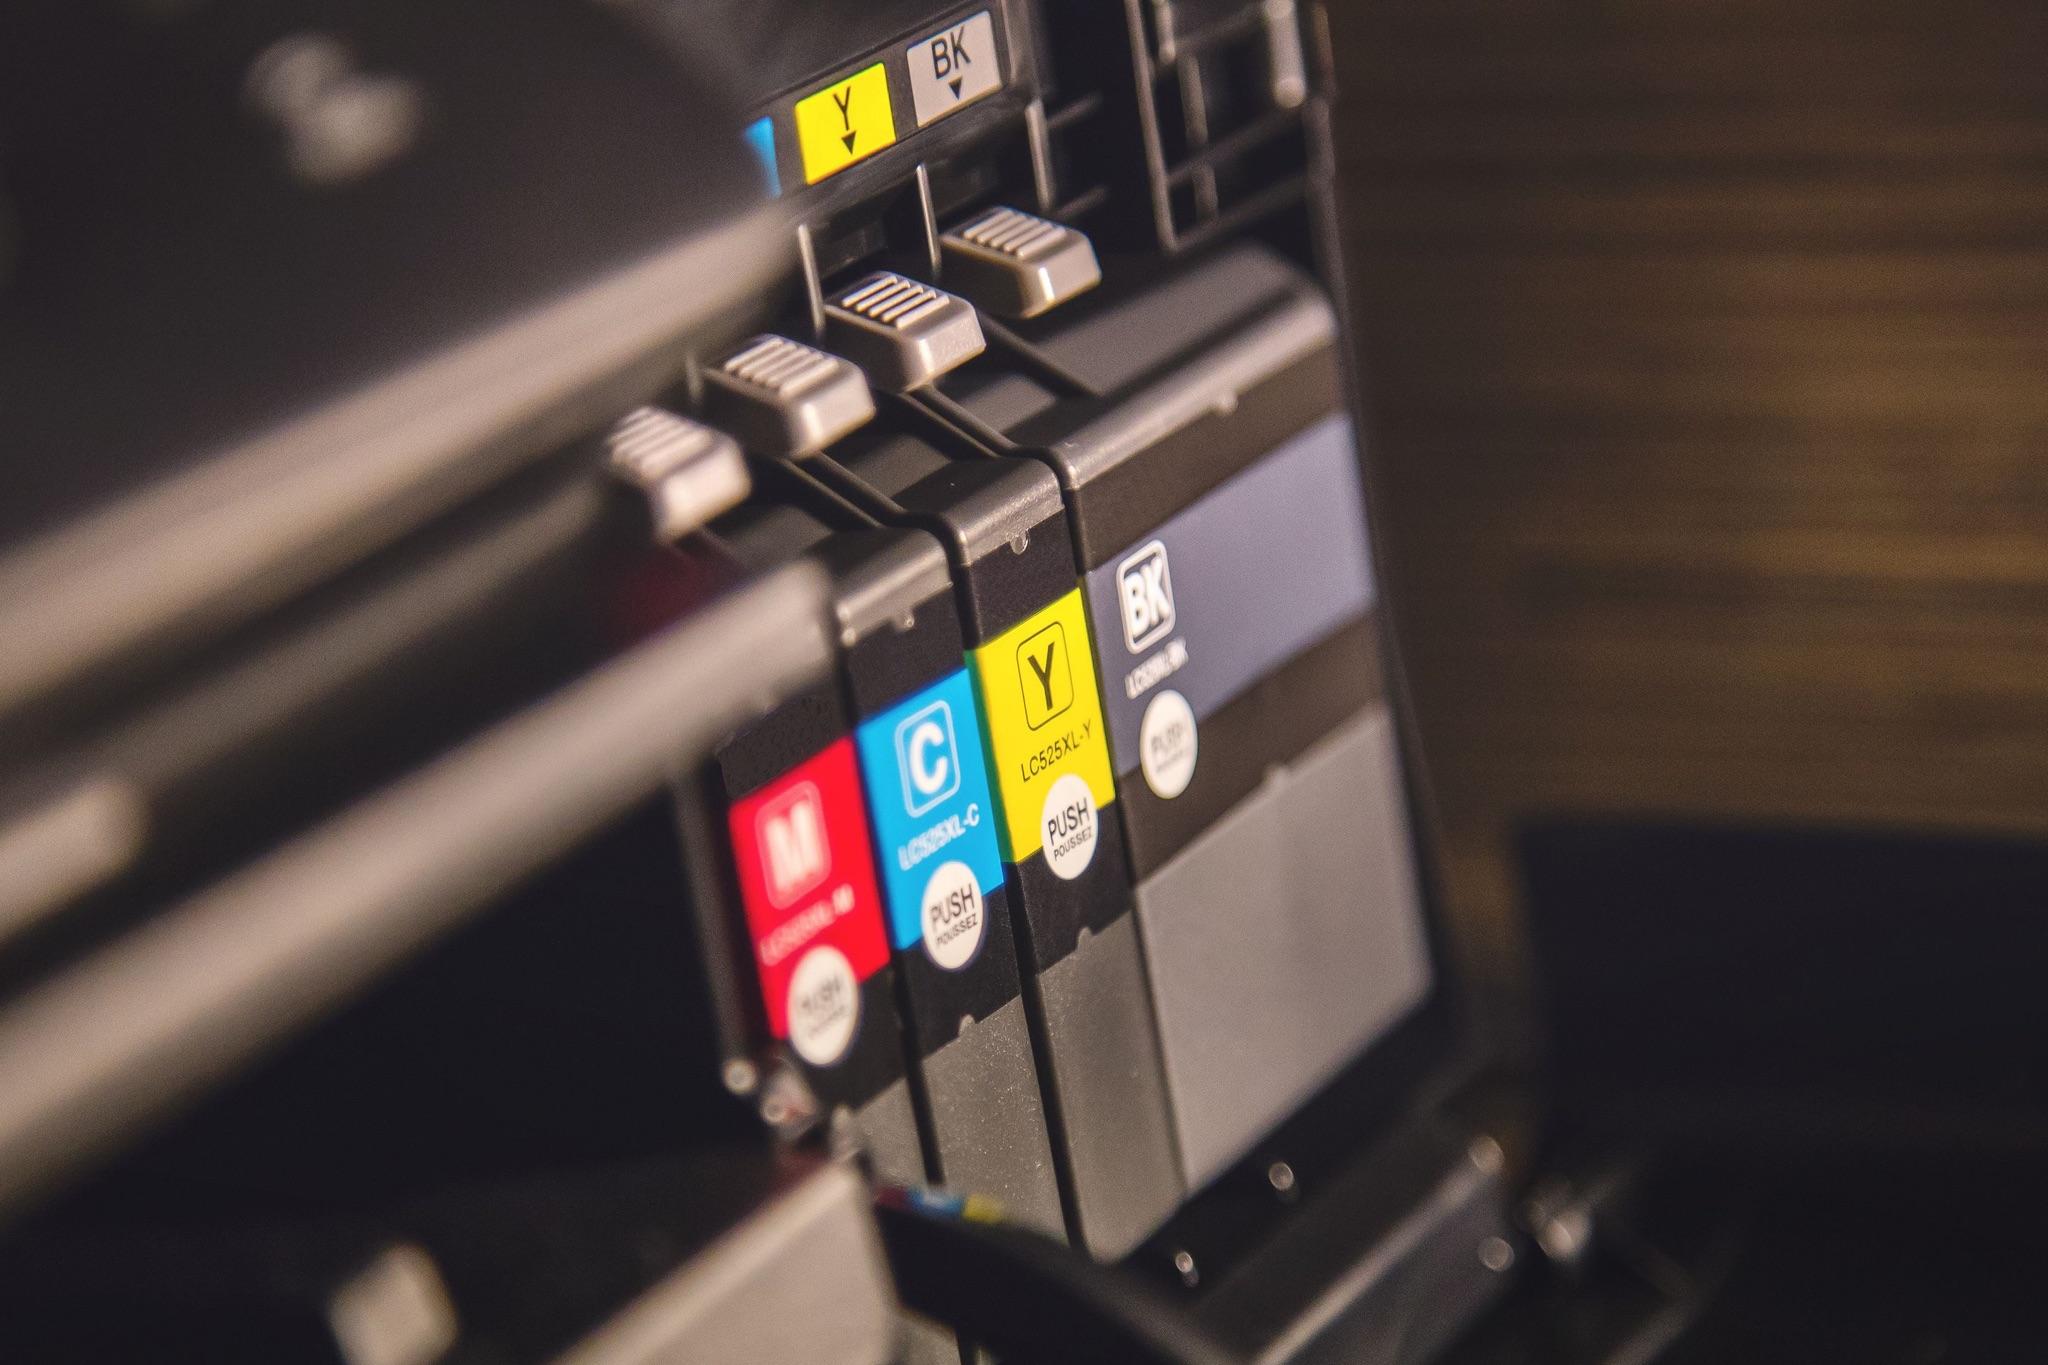 Printer compressor